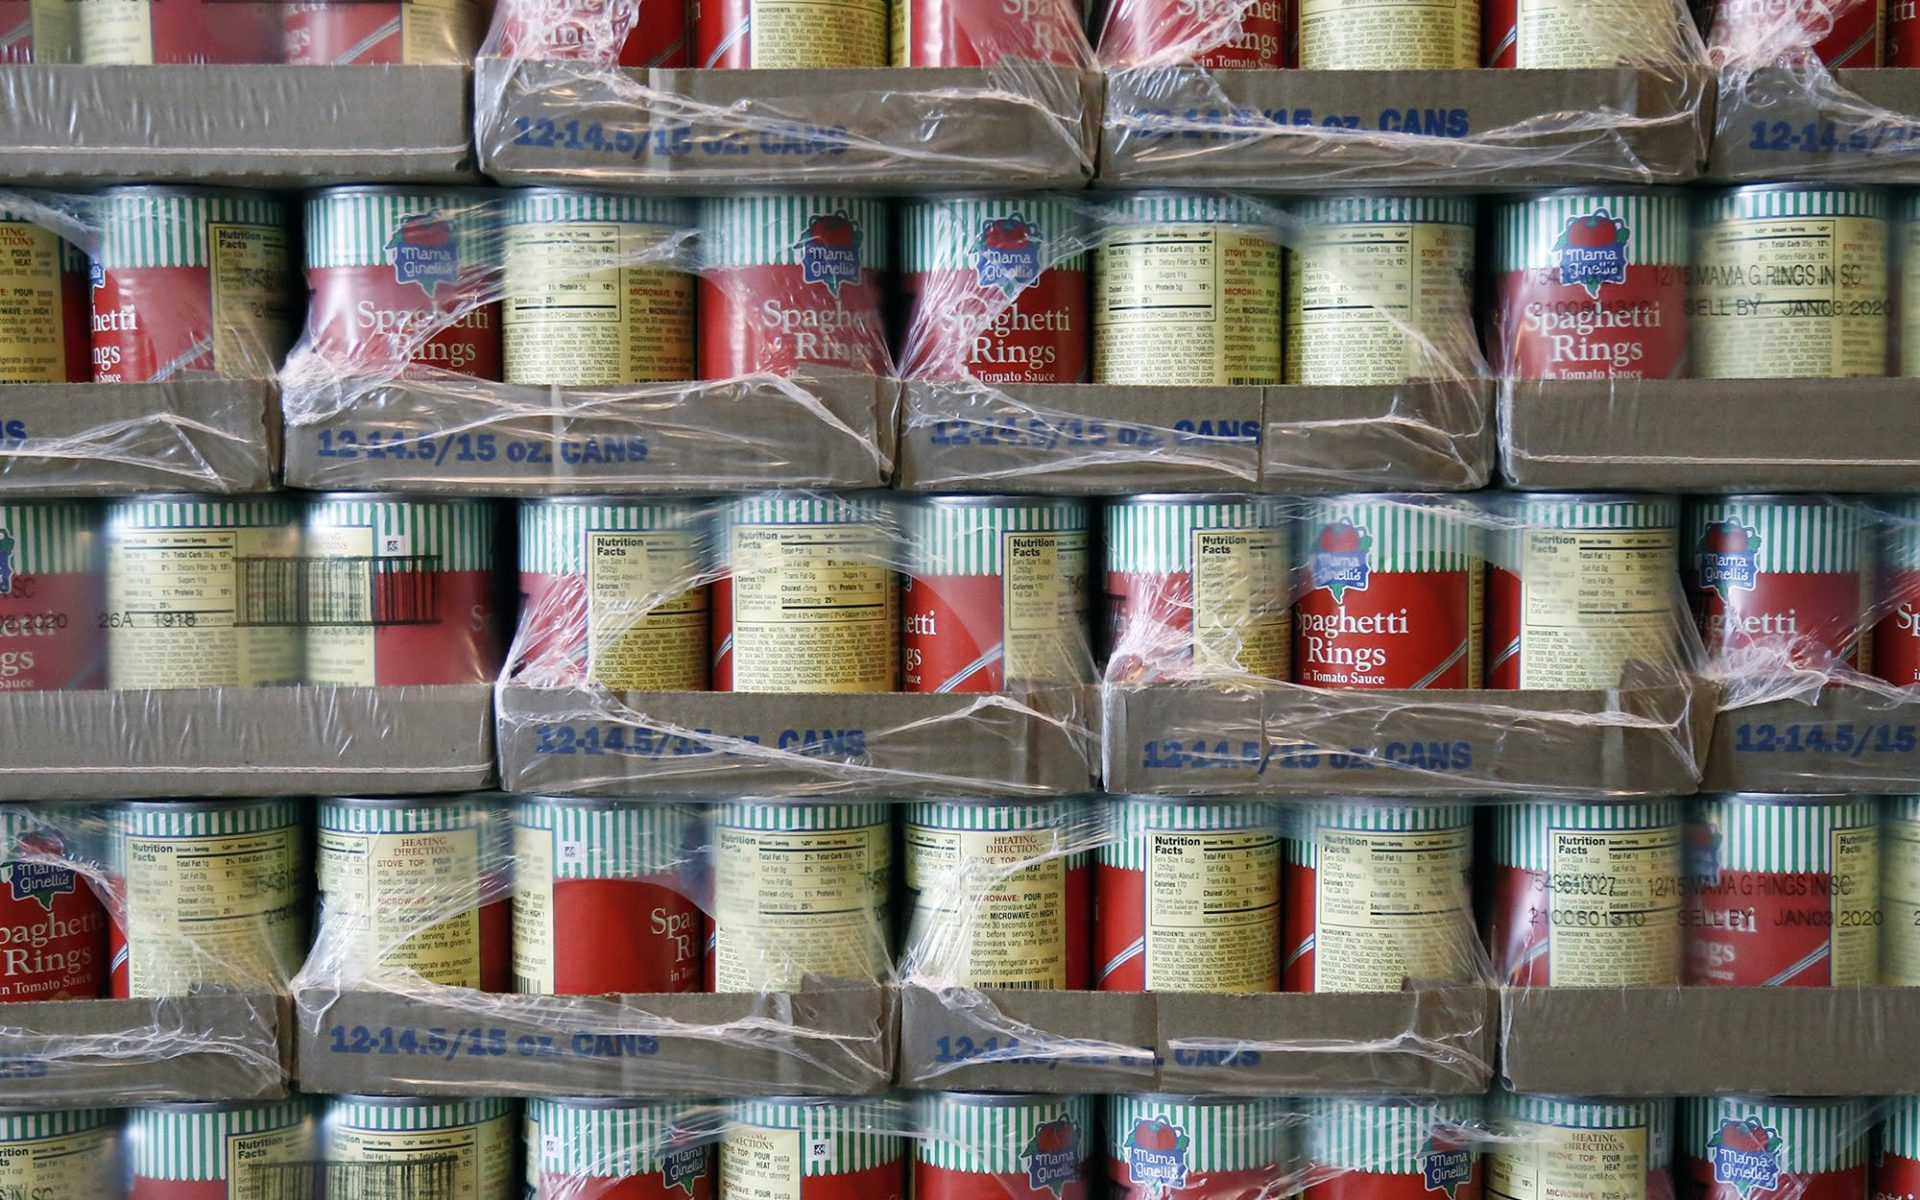 Food resource during pandemic